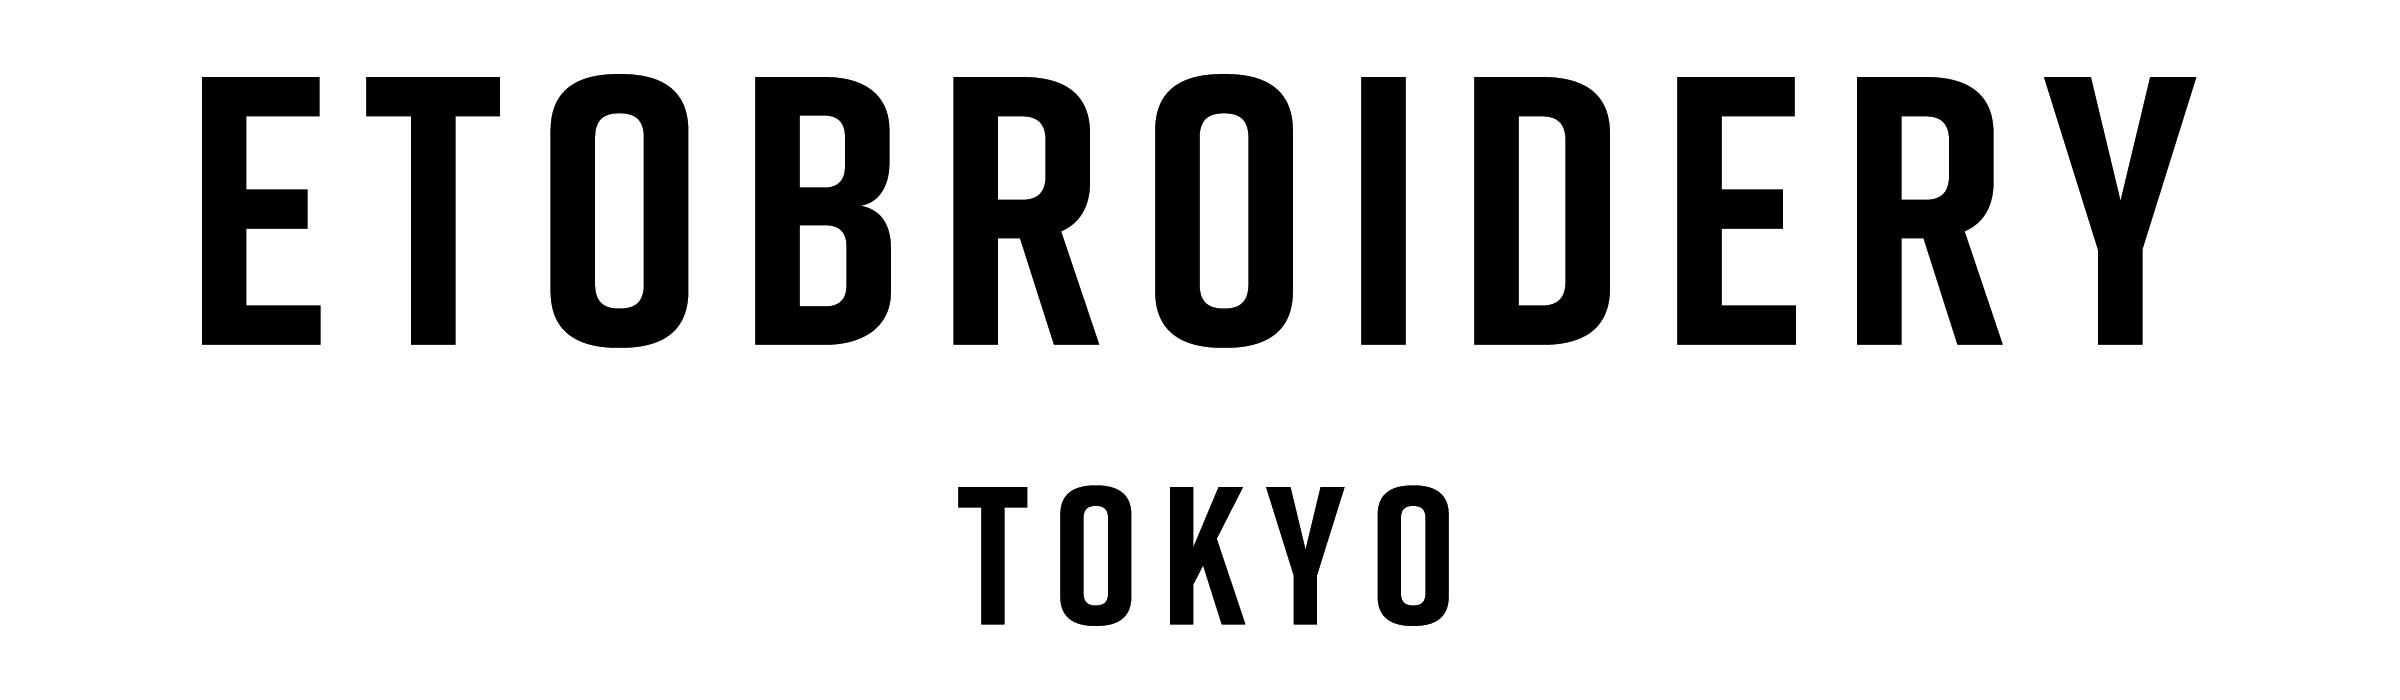 ETOBROIDERY|ONLINE STORE